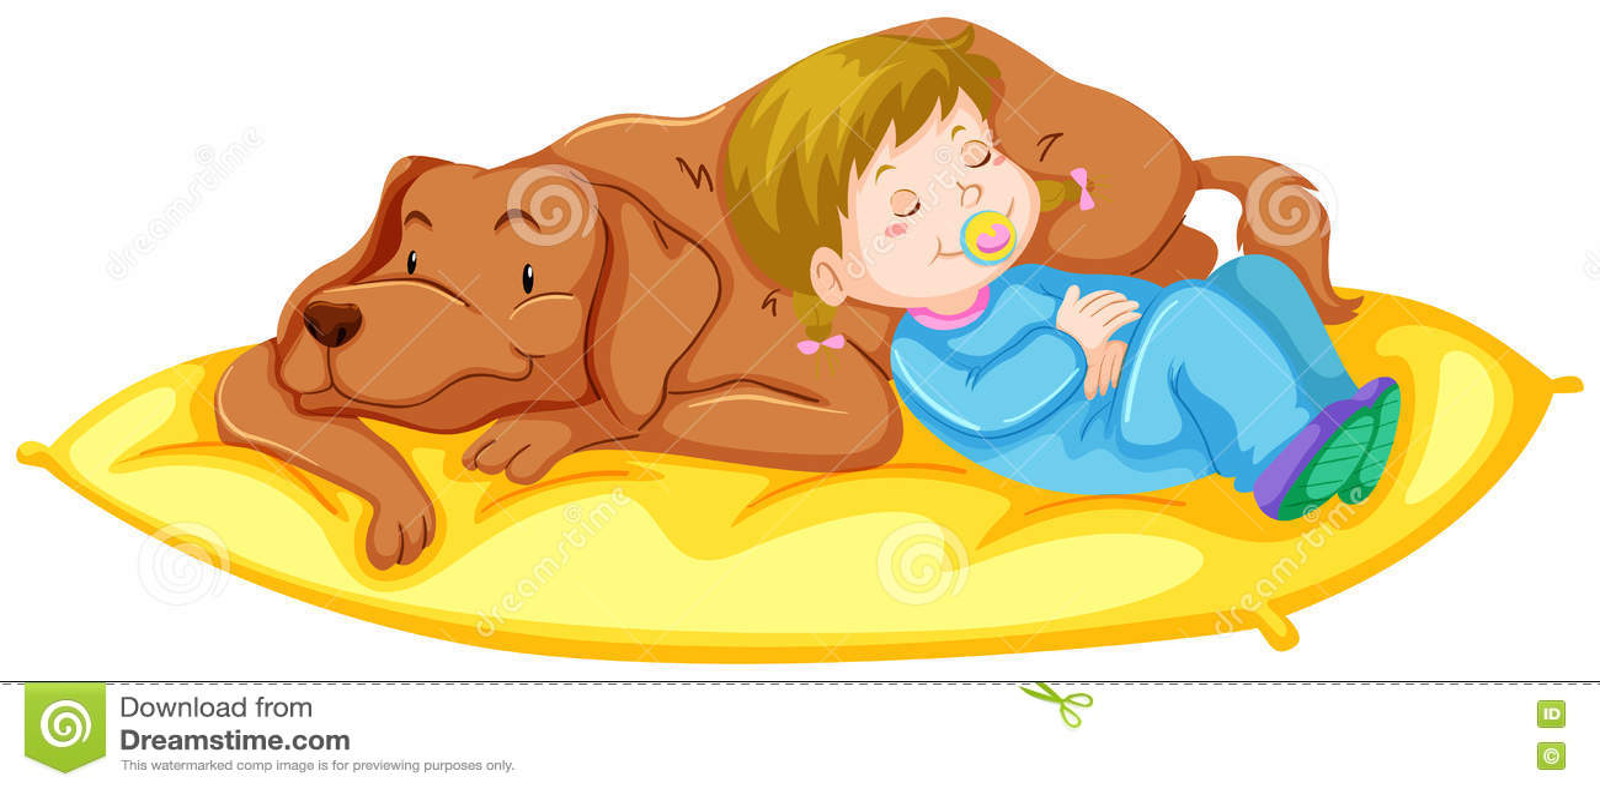 hight resolution of dog and girl sleeping on mat